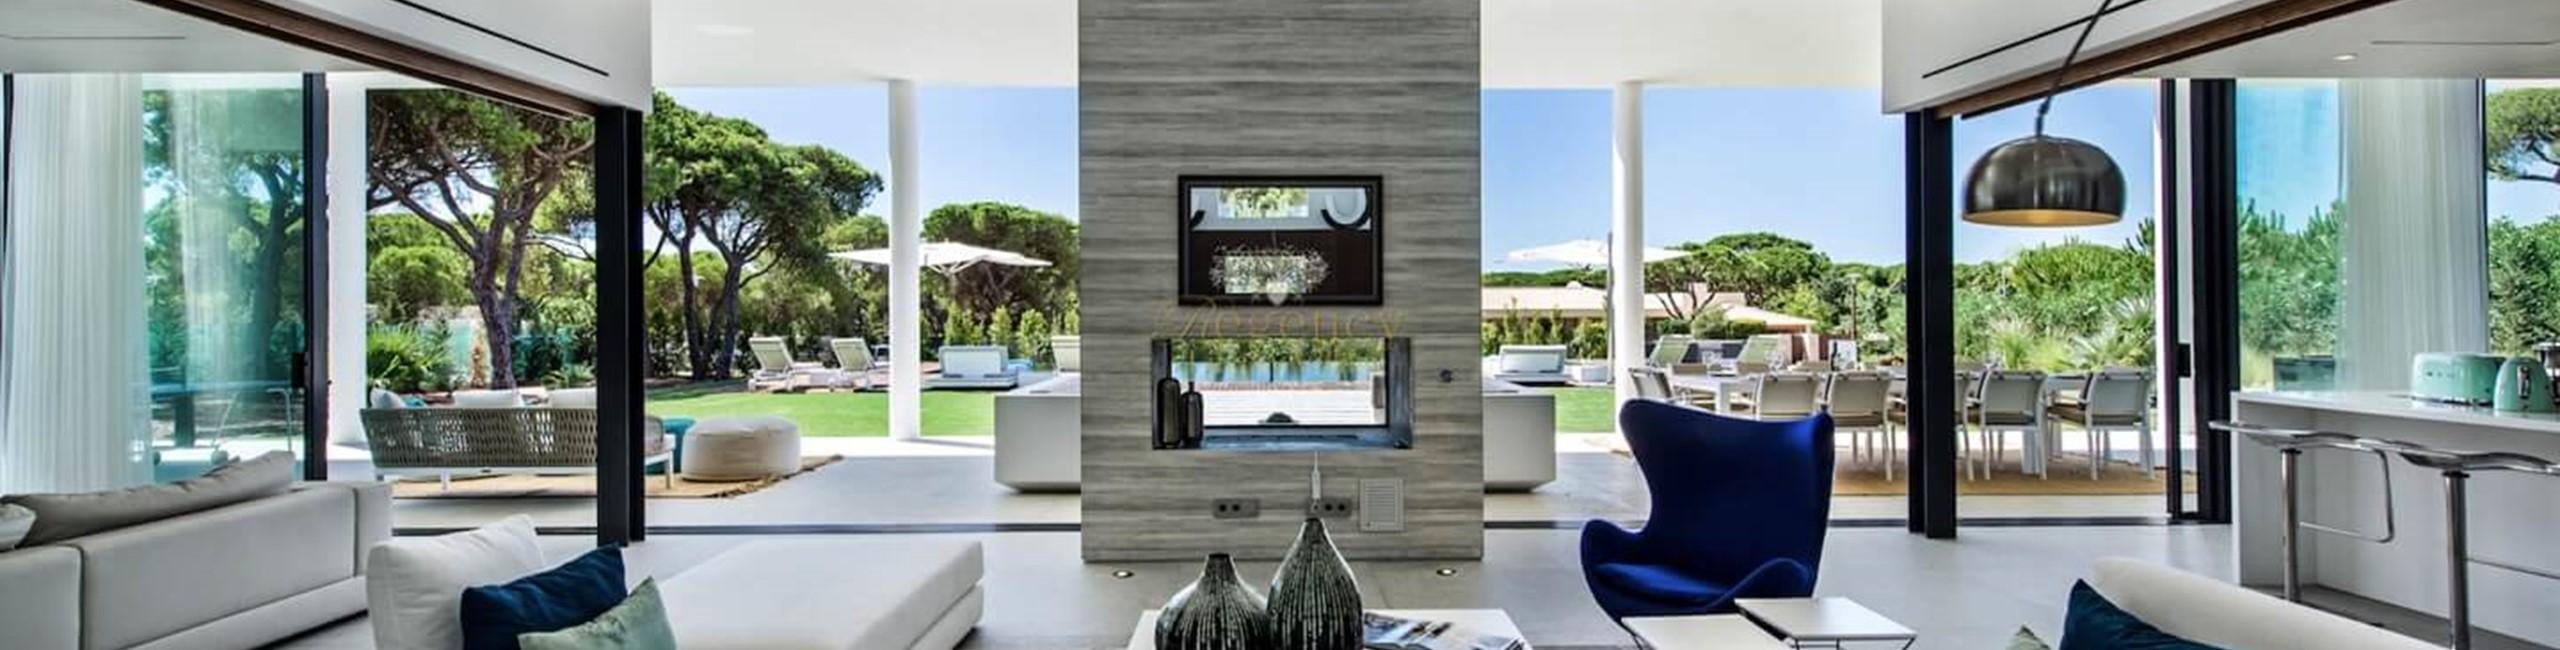 Villa To Rent In Vilamoura Algarve Portugal Regency Luxury Villas